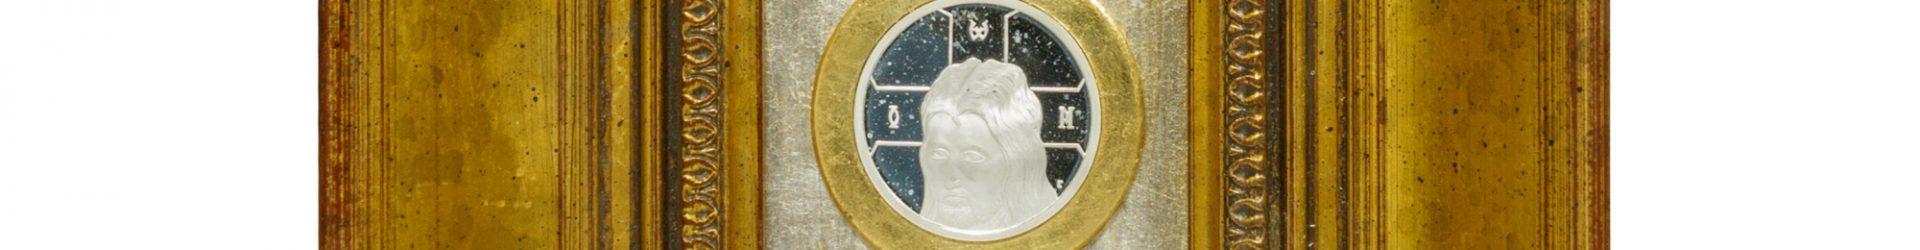 Icoana – Medalion Iisus